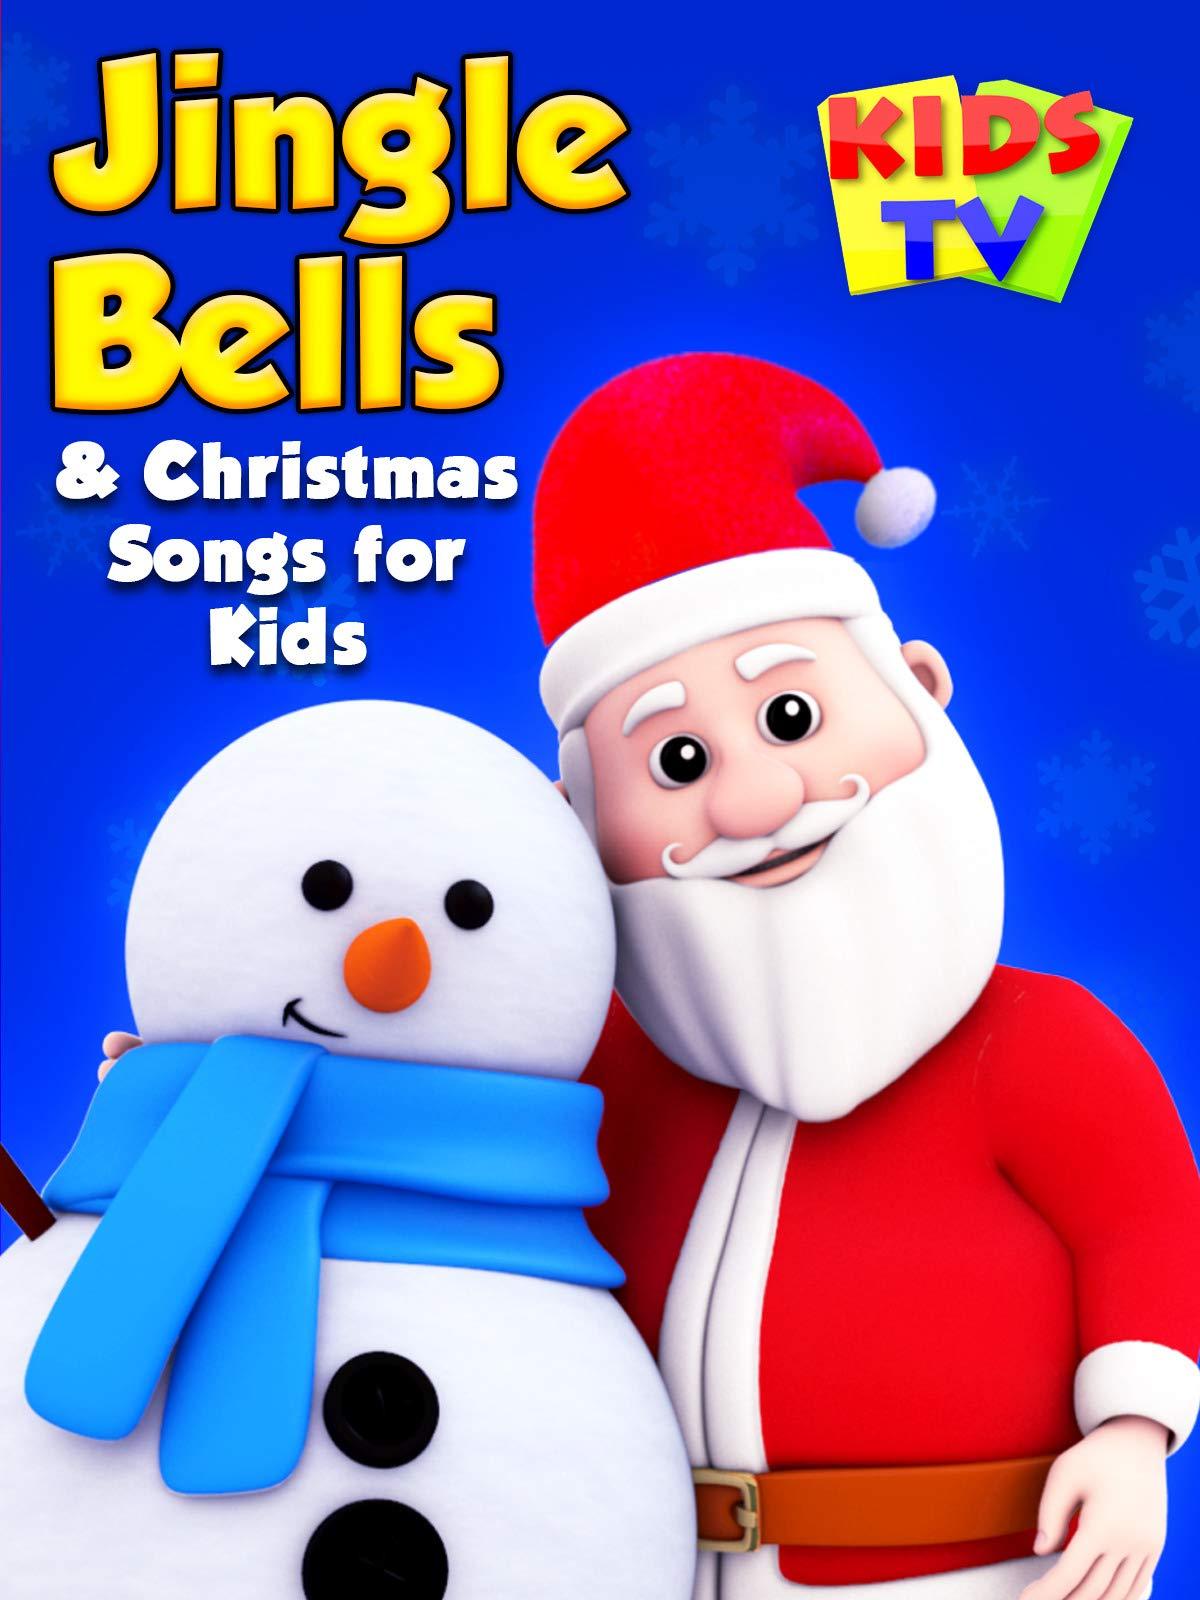 Jingle Bells & Christmas Songs for Kids - Kids TV on Amazon Prime Video UK